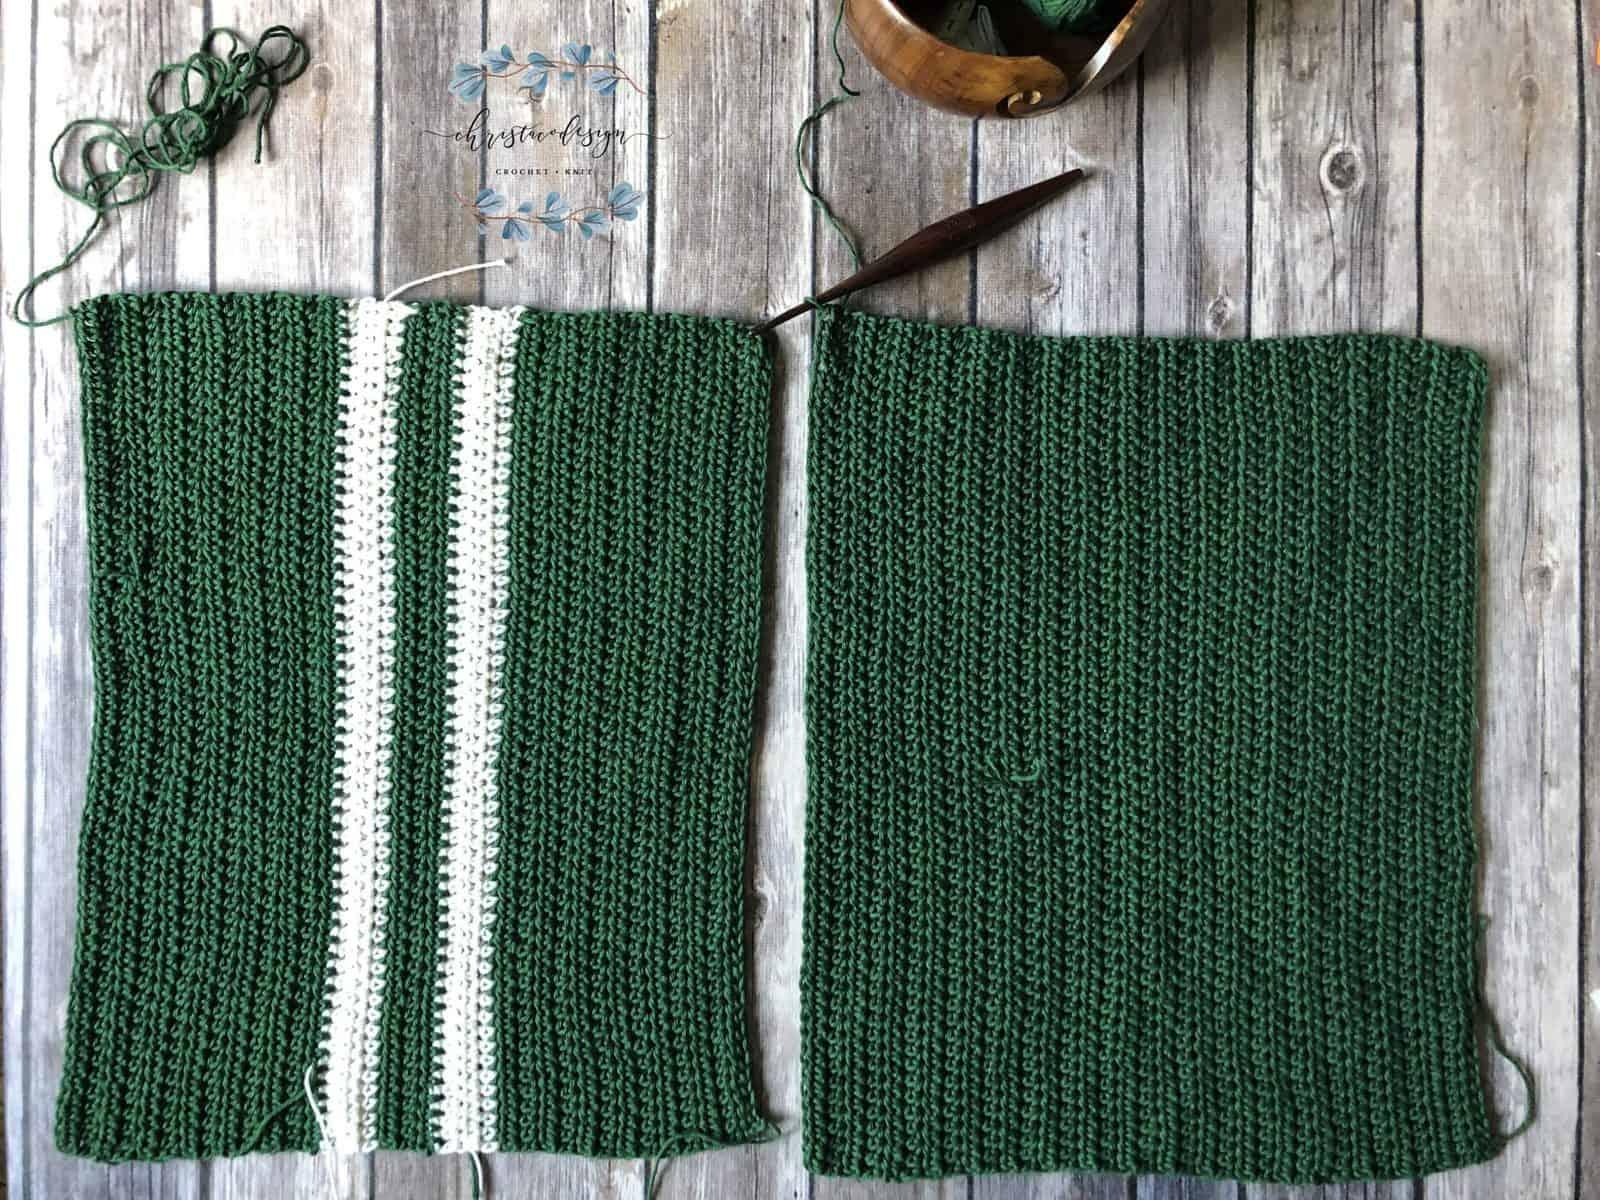 picture of two crochet refcatngles side bye side in green for crochet kids shirt